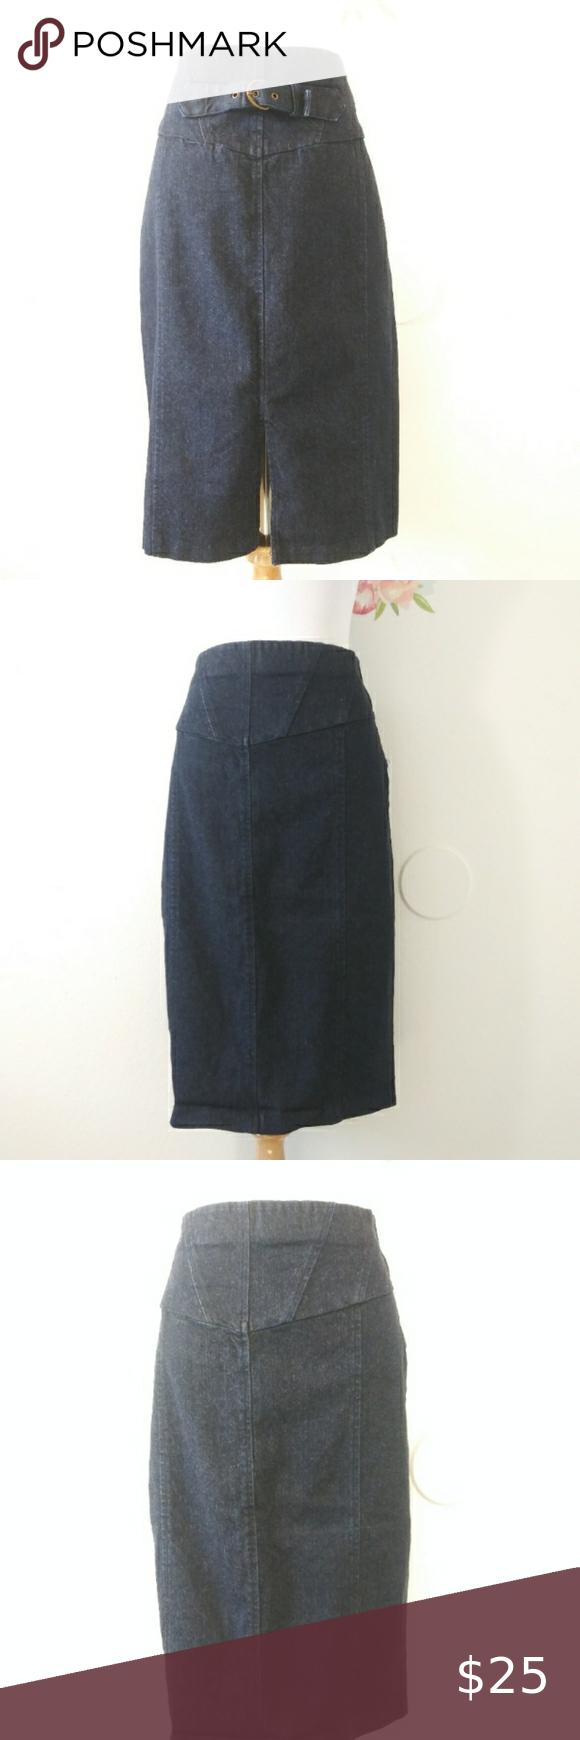 M/&S CLASSIC Textured A-Line Midi Skirt ~ Length 68-9cm ~ Navy